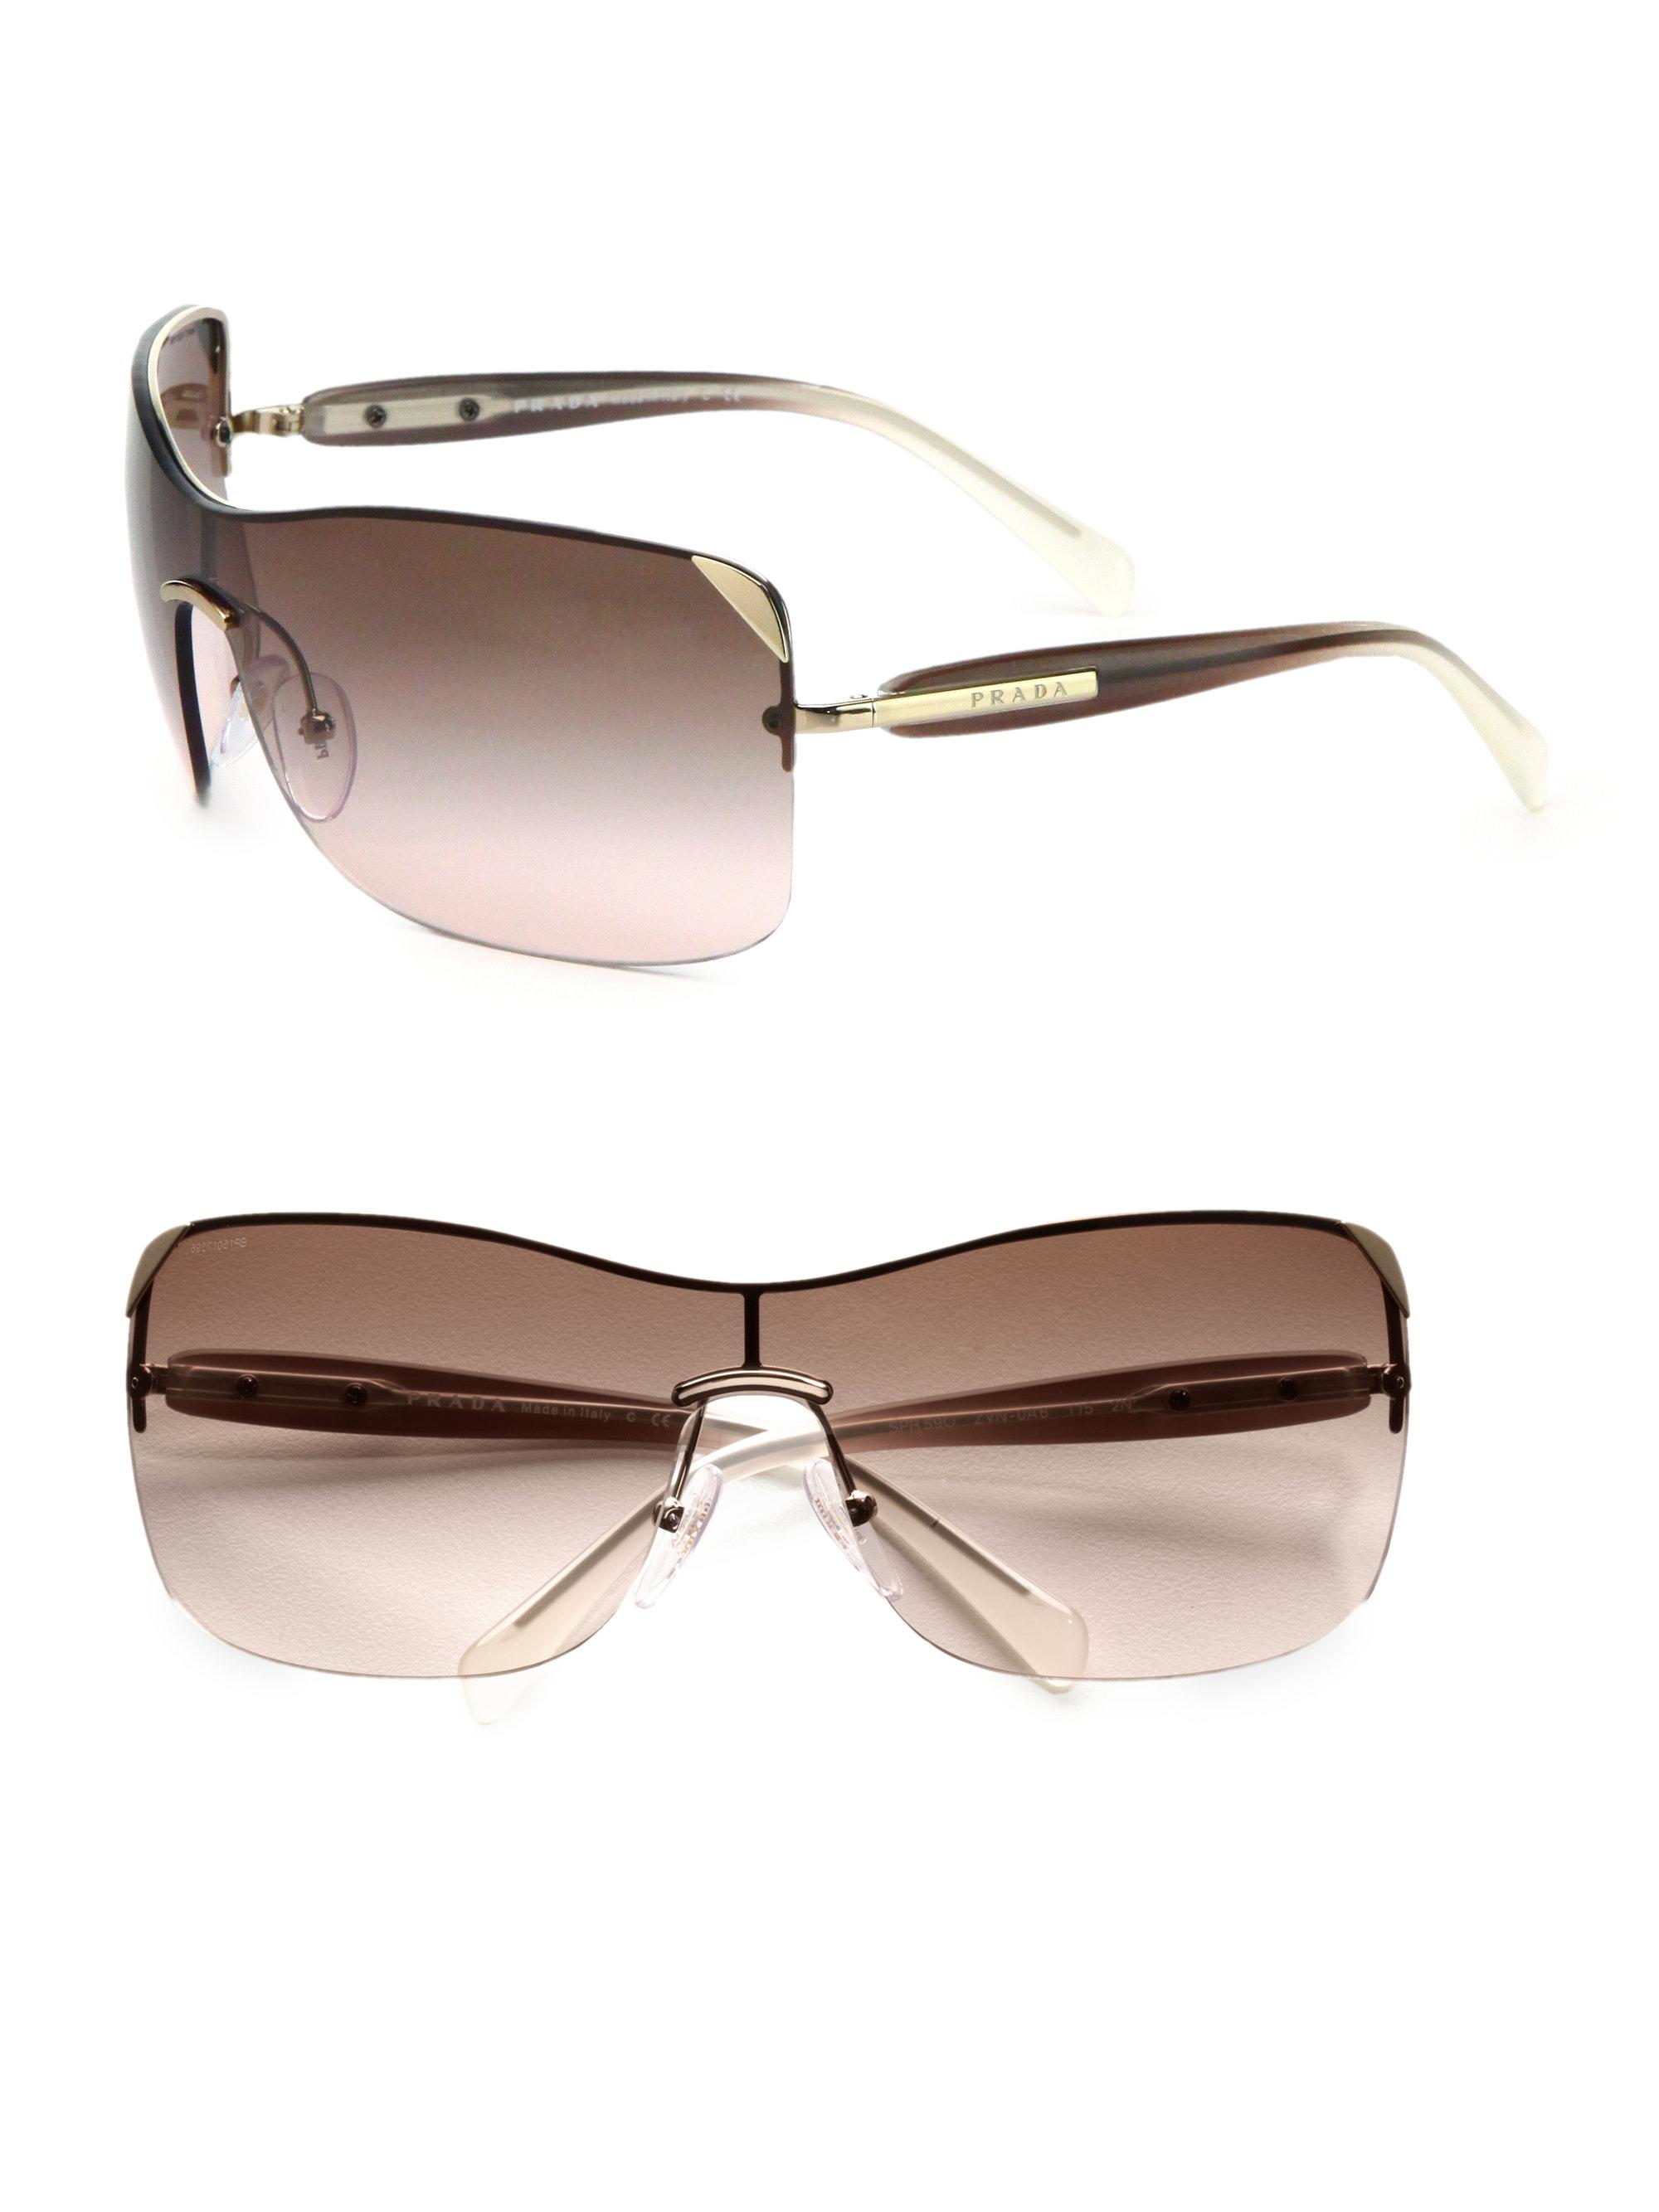 Prada Shield Sunglasses  prada rectangular rimless shield sunglasses in natural lyst